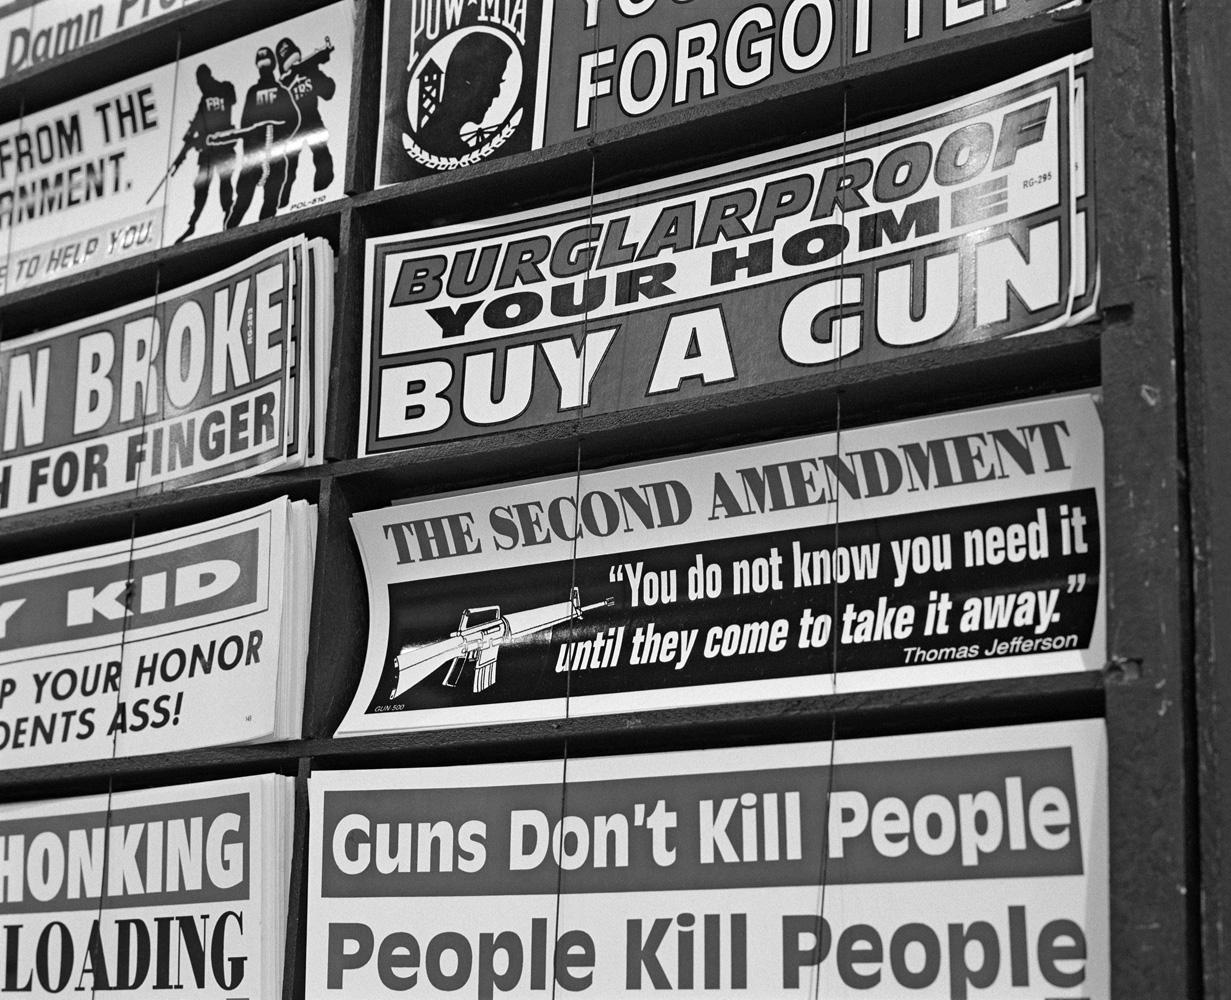 Pro-gun bumper-stickers in Las Vegas.